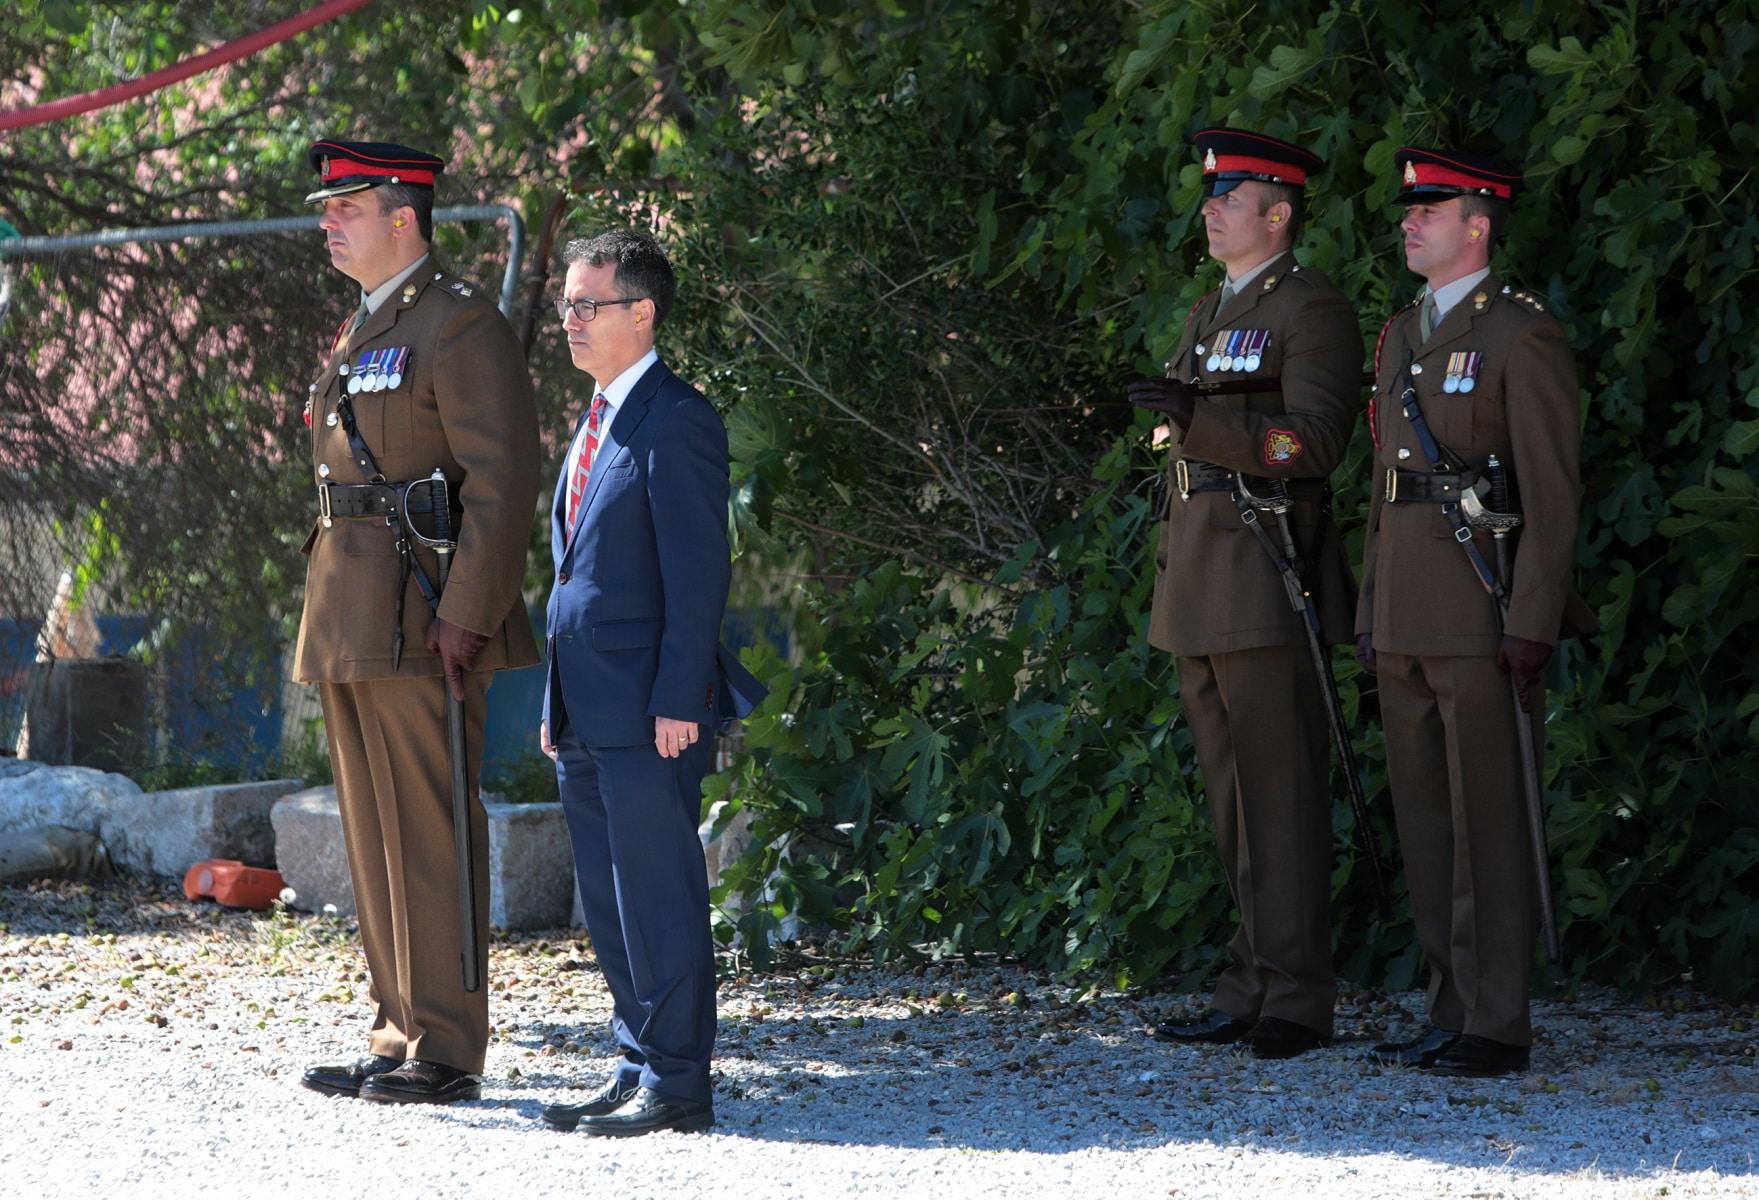 2-jun-2016-salvas-en-gibraltar-honor-al-aniversario-de-coronacin-de-la-reina_26808903004_o